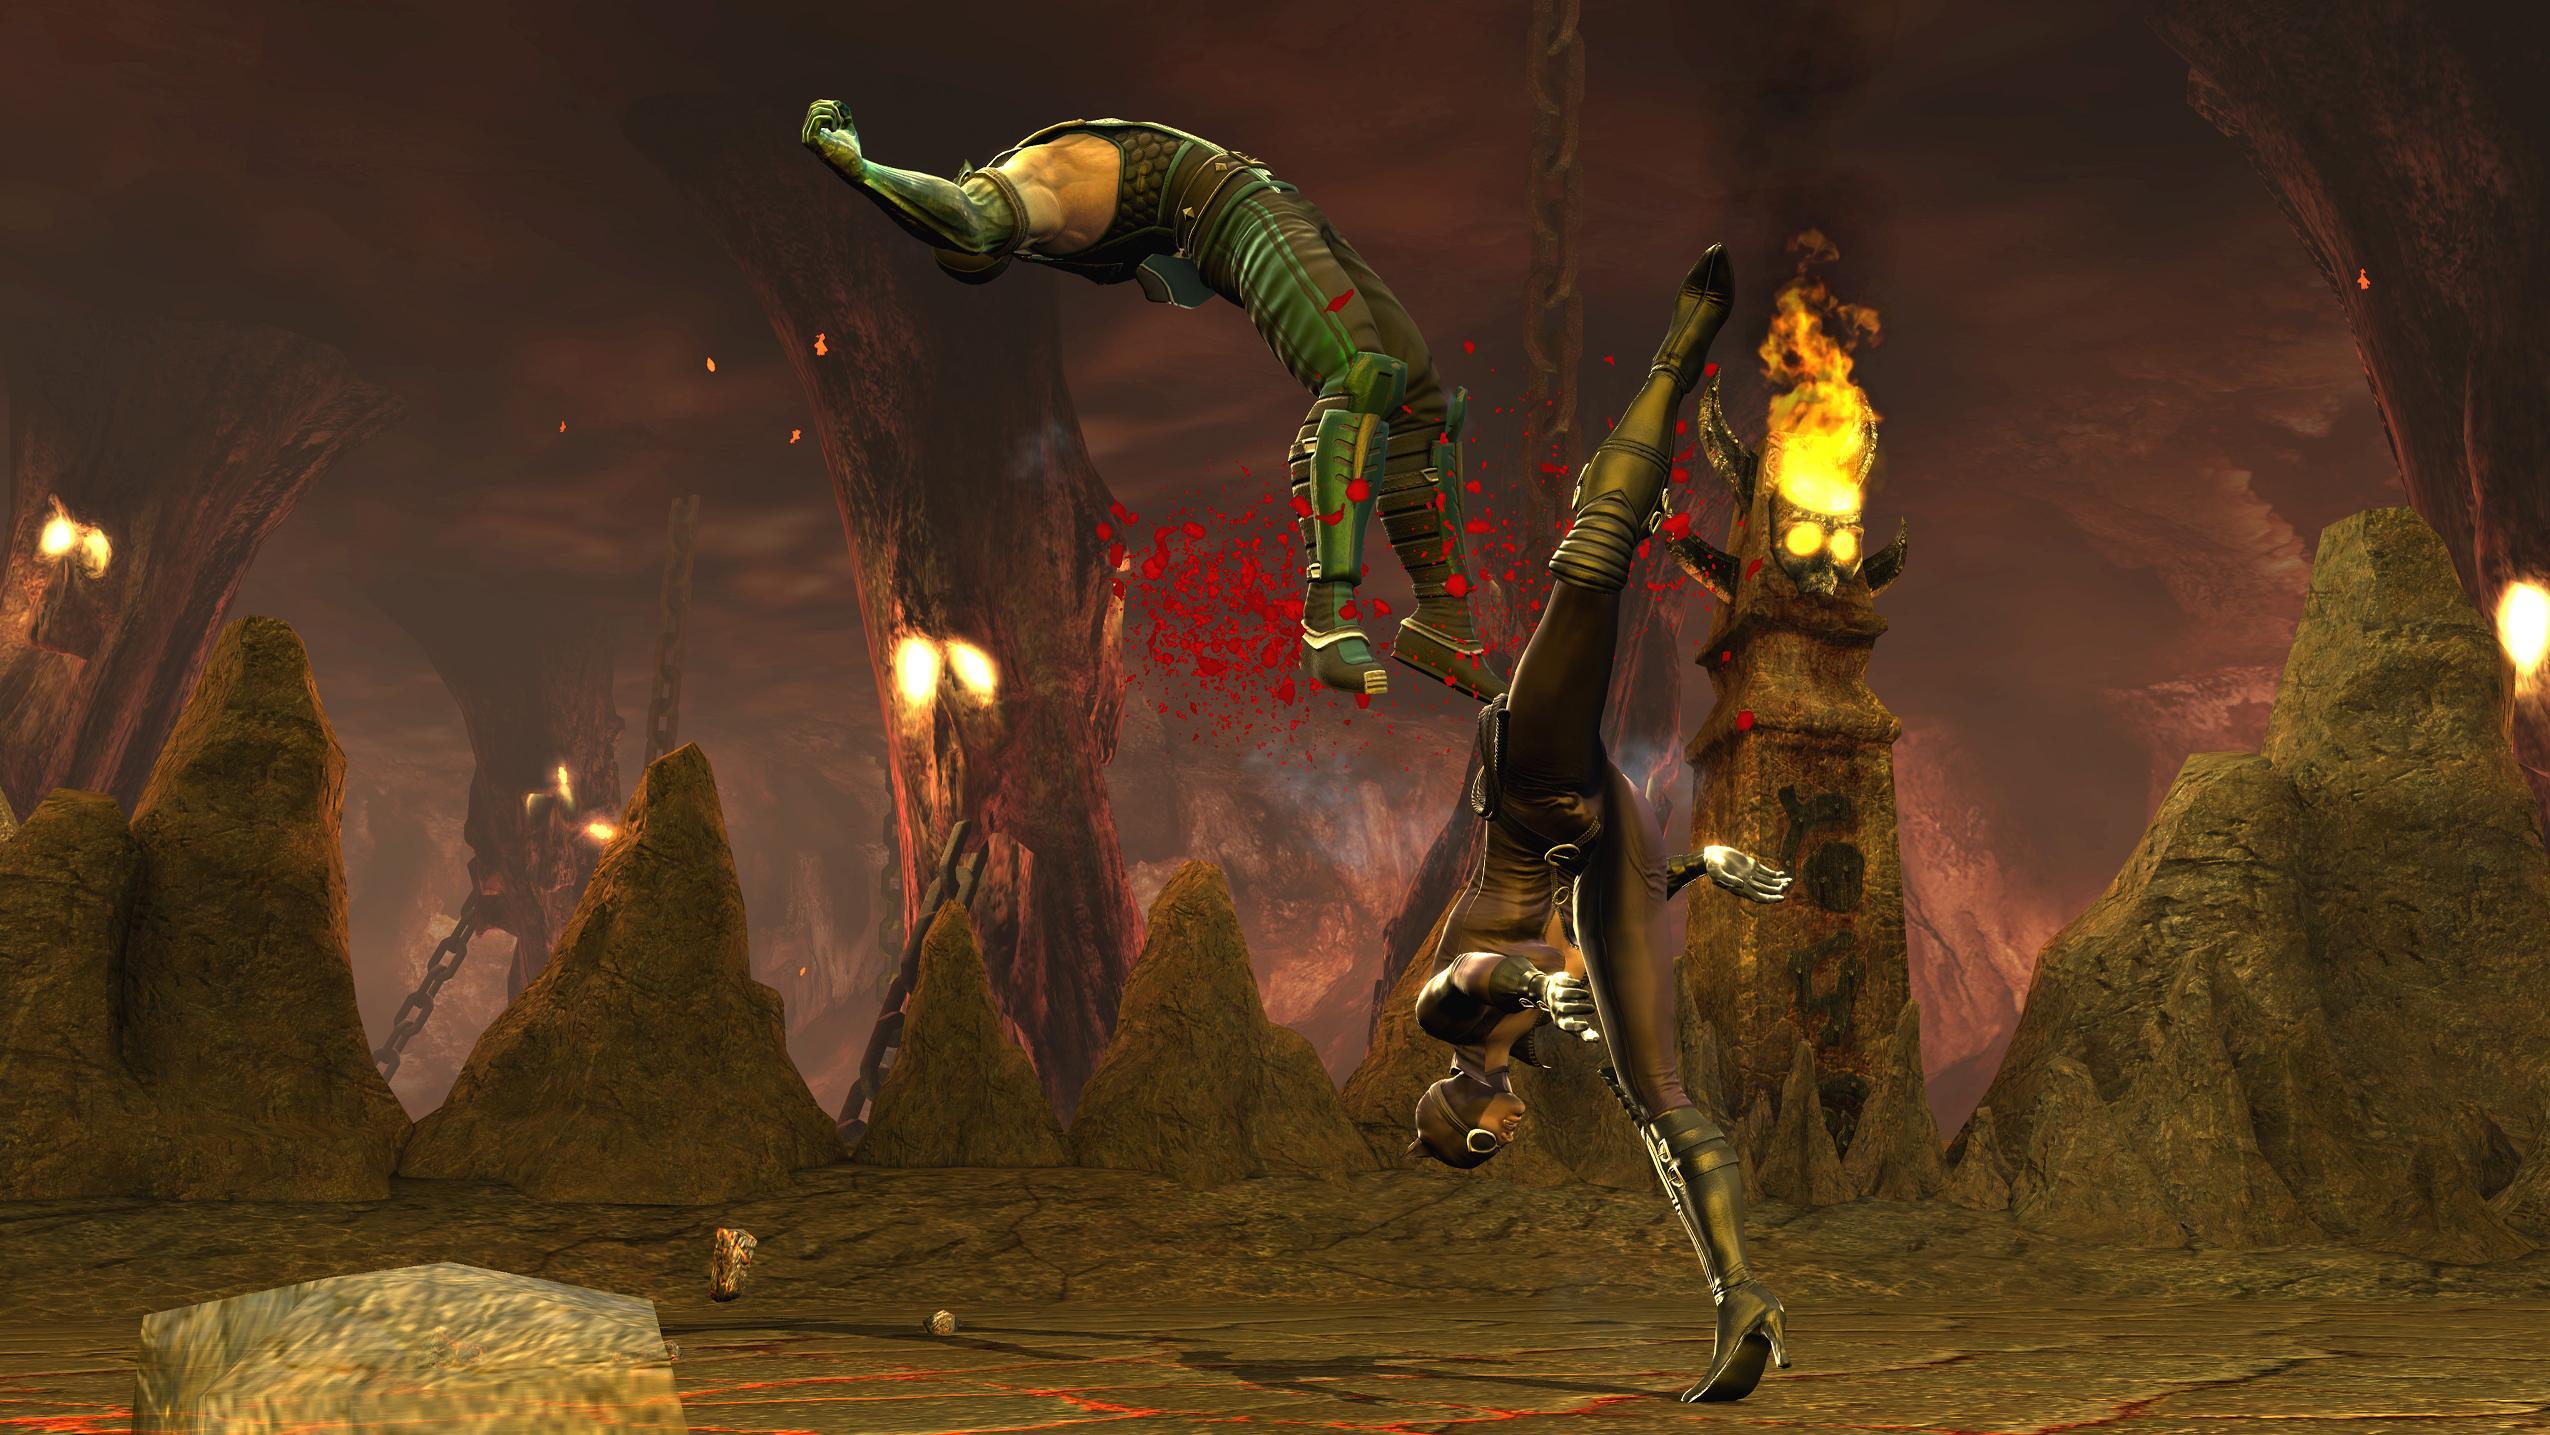 Mortal Kombat vs. DC Universe - Mortal Kombat vs. DC Universe 2K